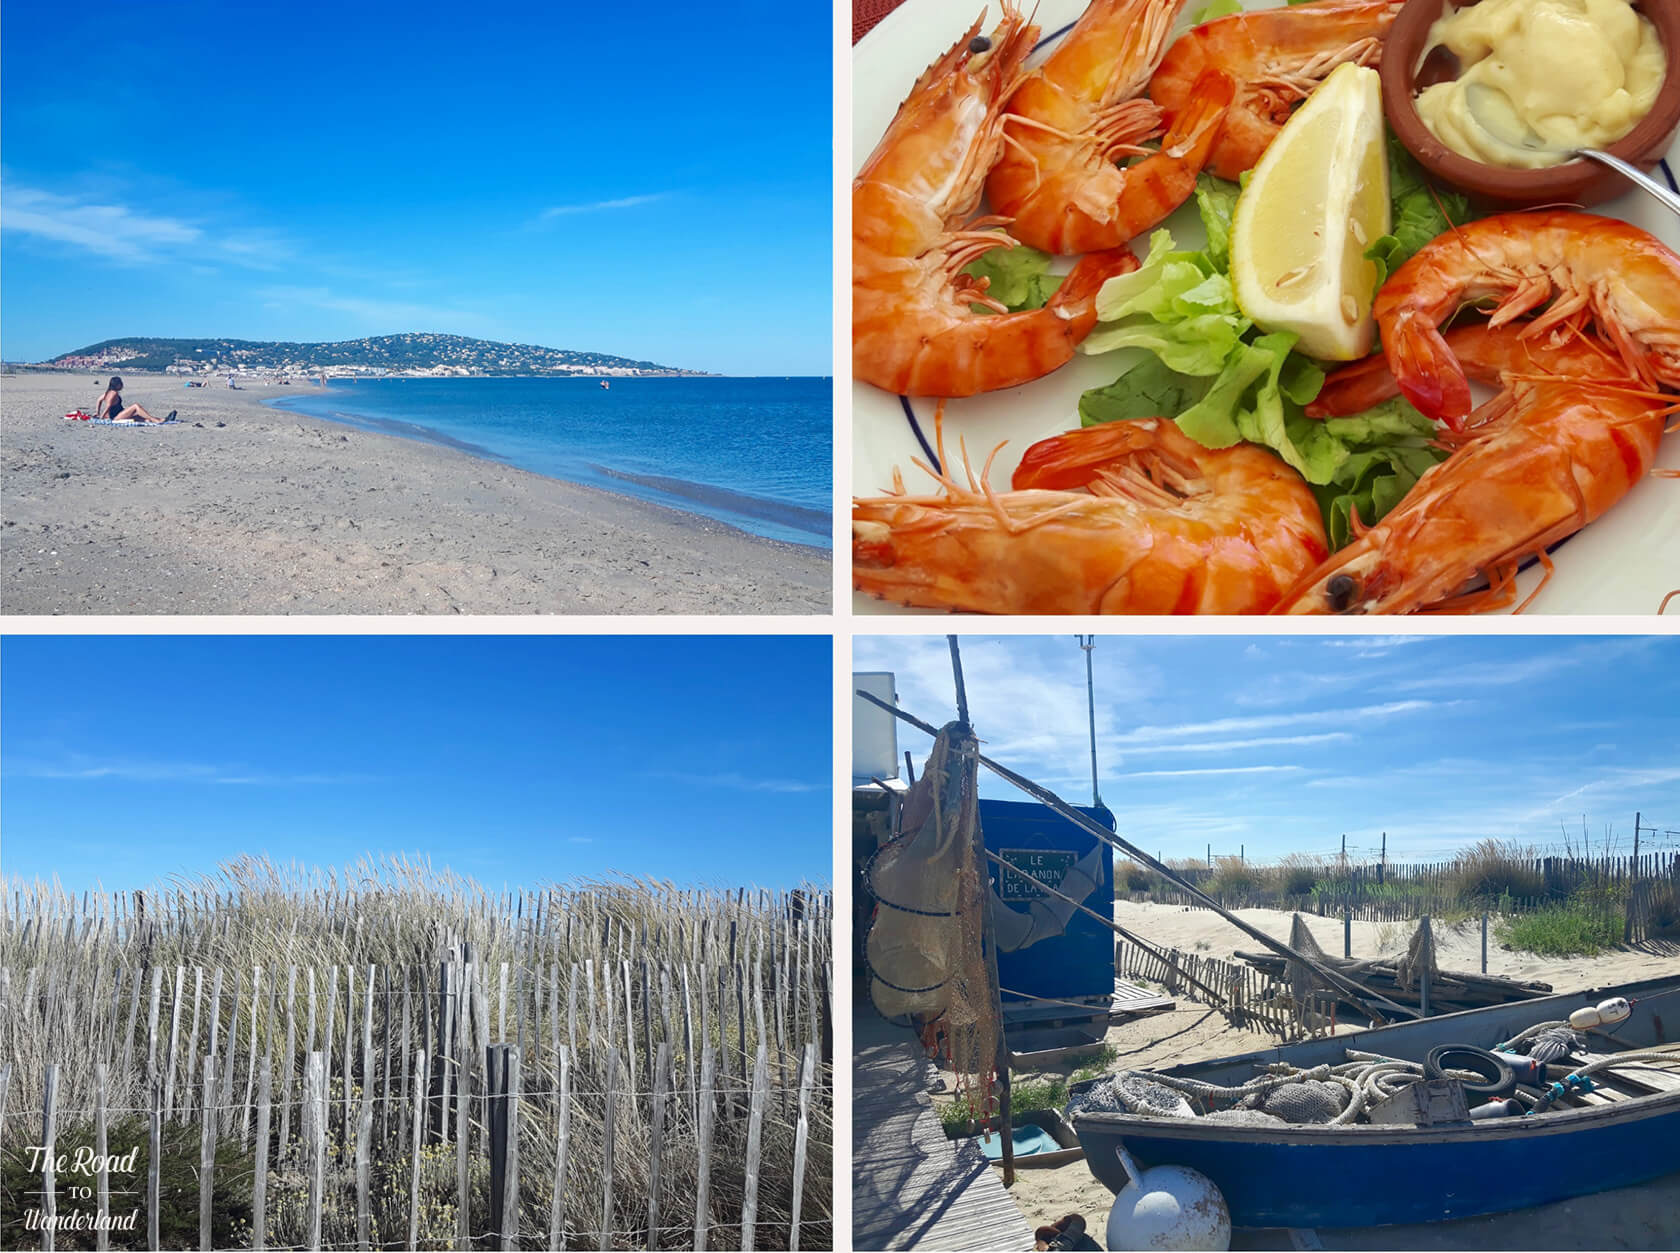 The beaches of Sète